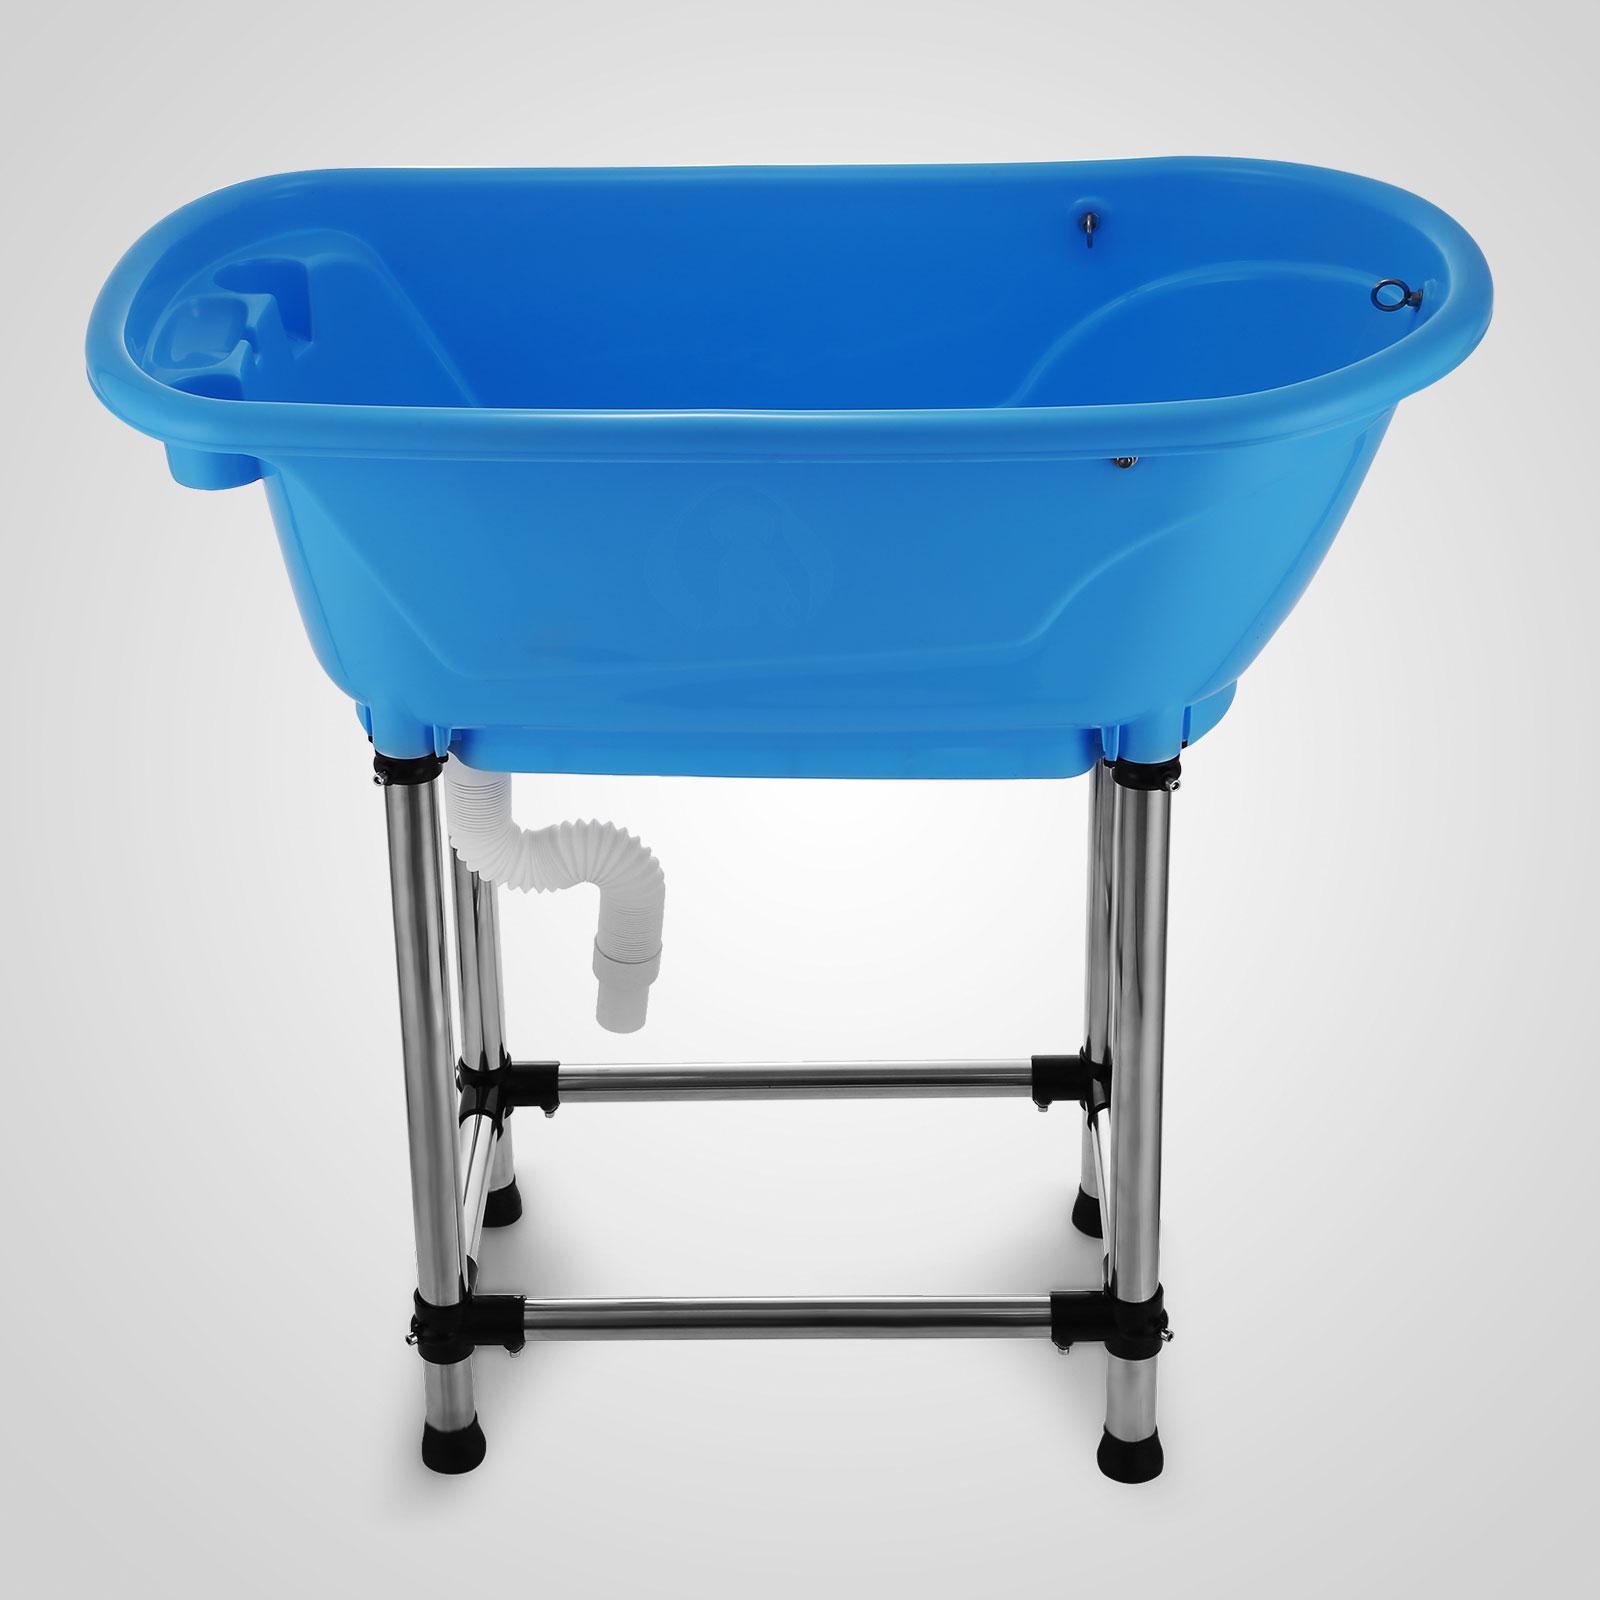 vevor fibre glass fibreglass plastic dog pet cat grooming bath tub bathtub ebay. Black Bedroom Furniture Sets. Home Design Ideas